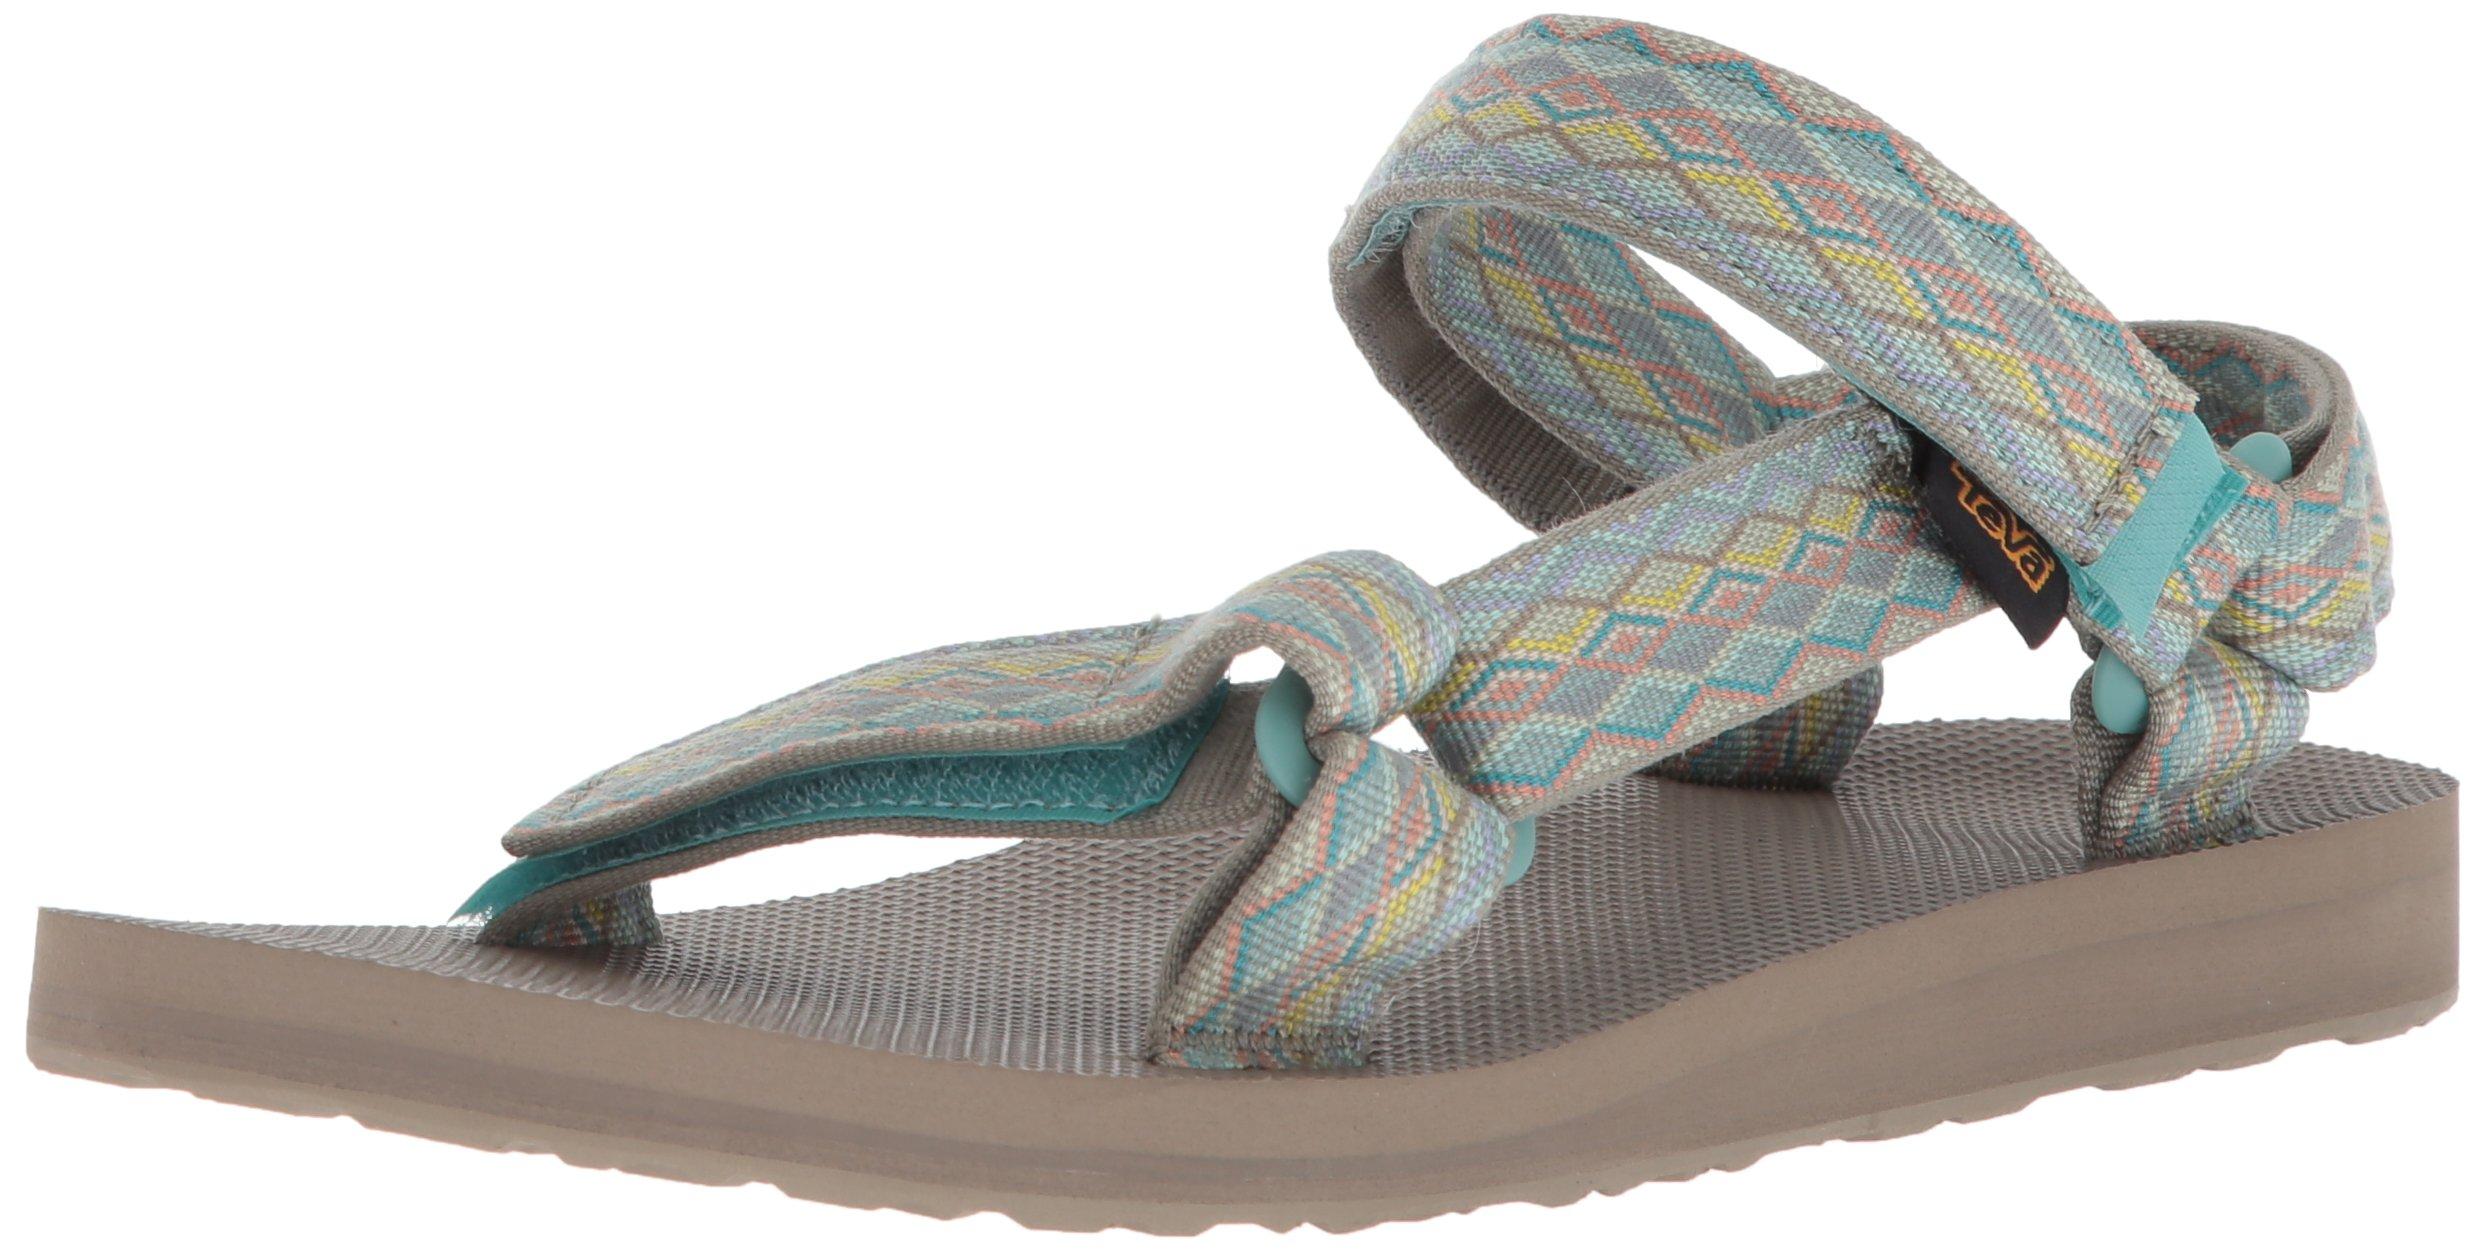 Teva Women's W Original Universal Sport Sandal, Miramar Fade Sage Multi, 7 M US